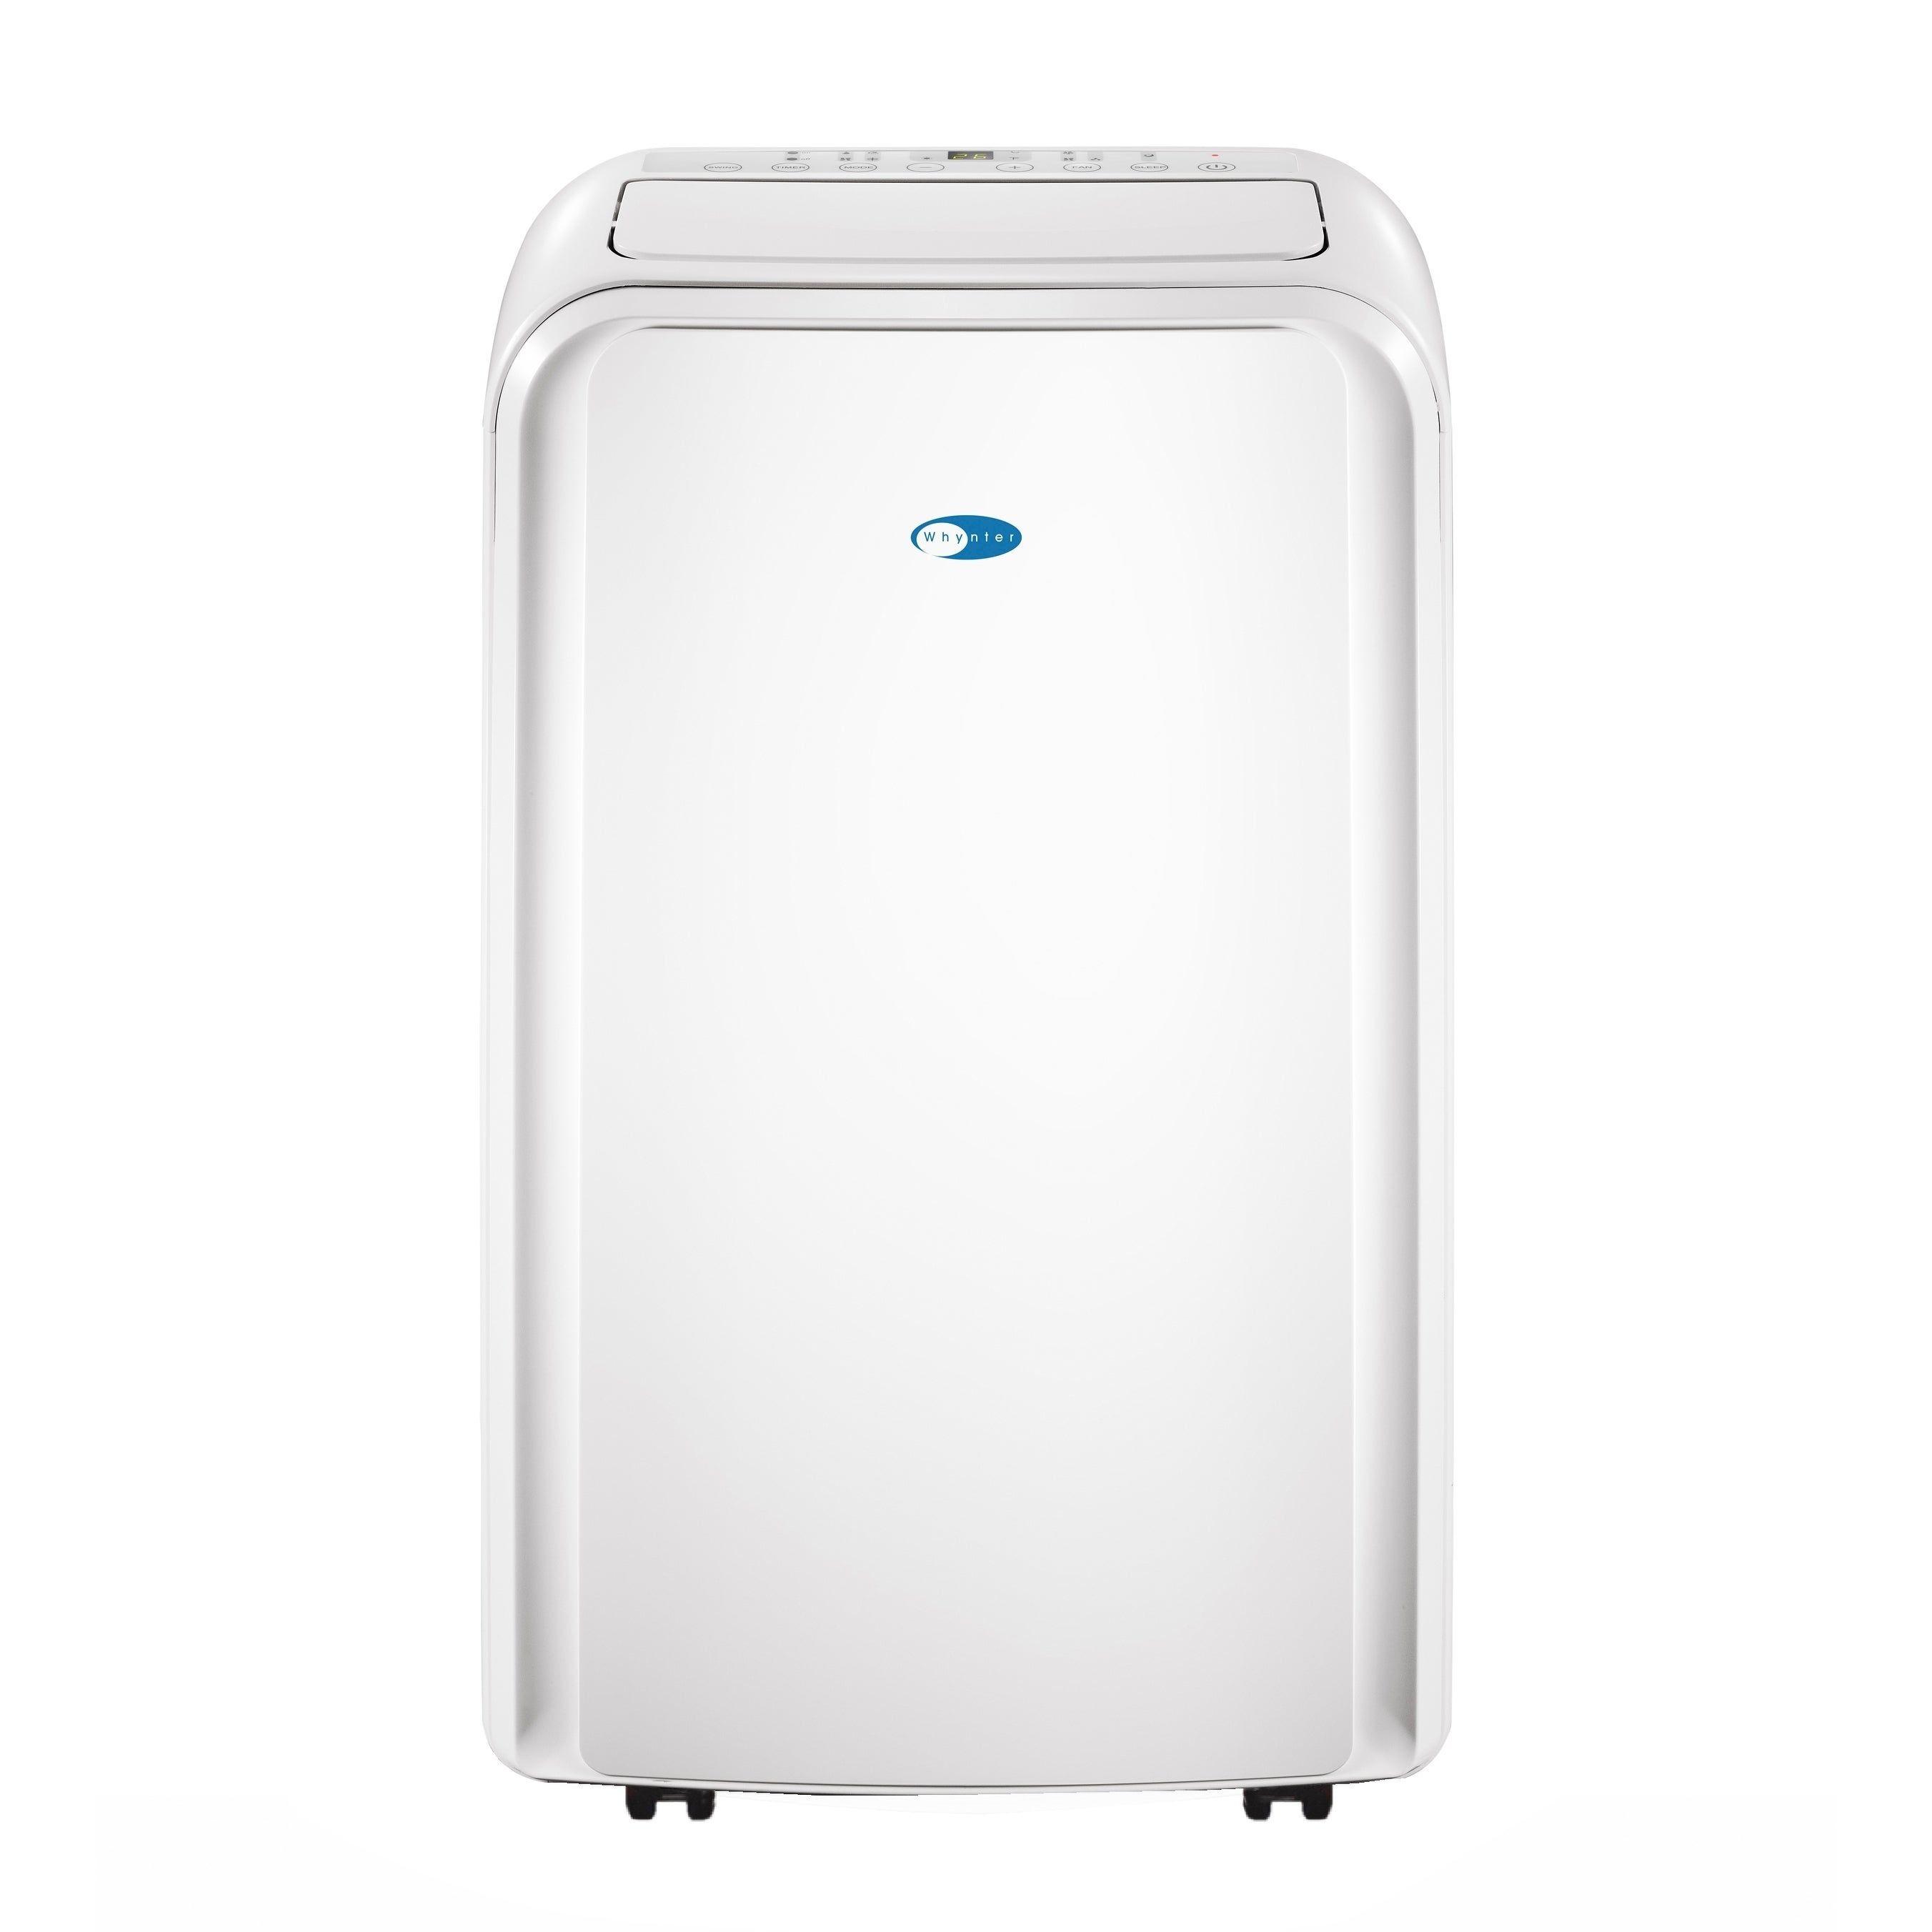 Whynter 12,000 BTU Dual Hose Portable Air Conditioner with